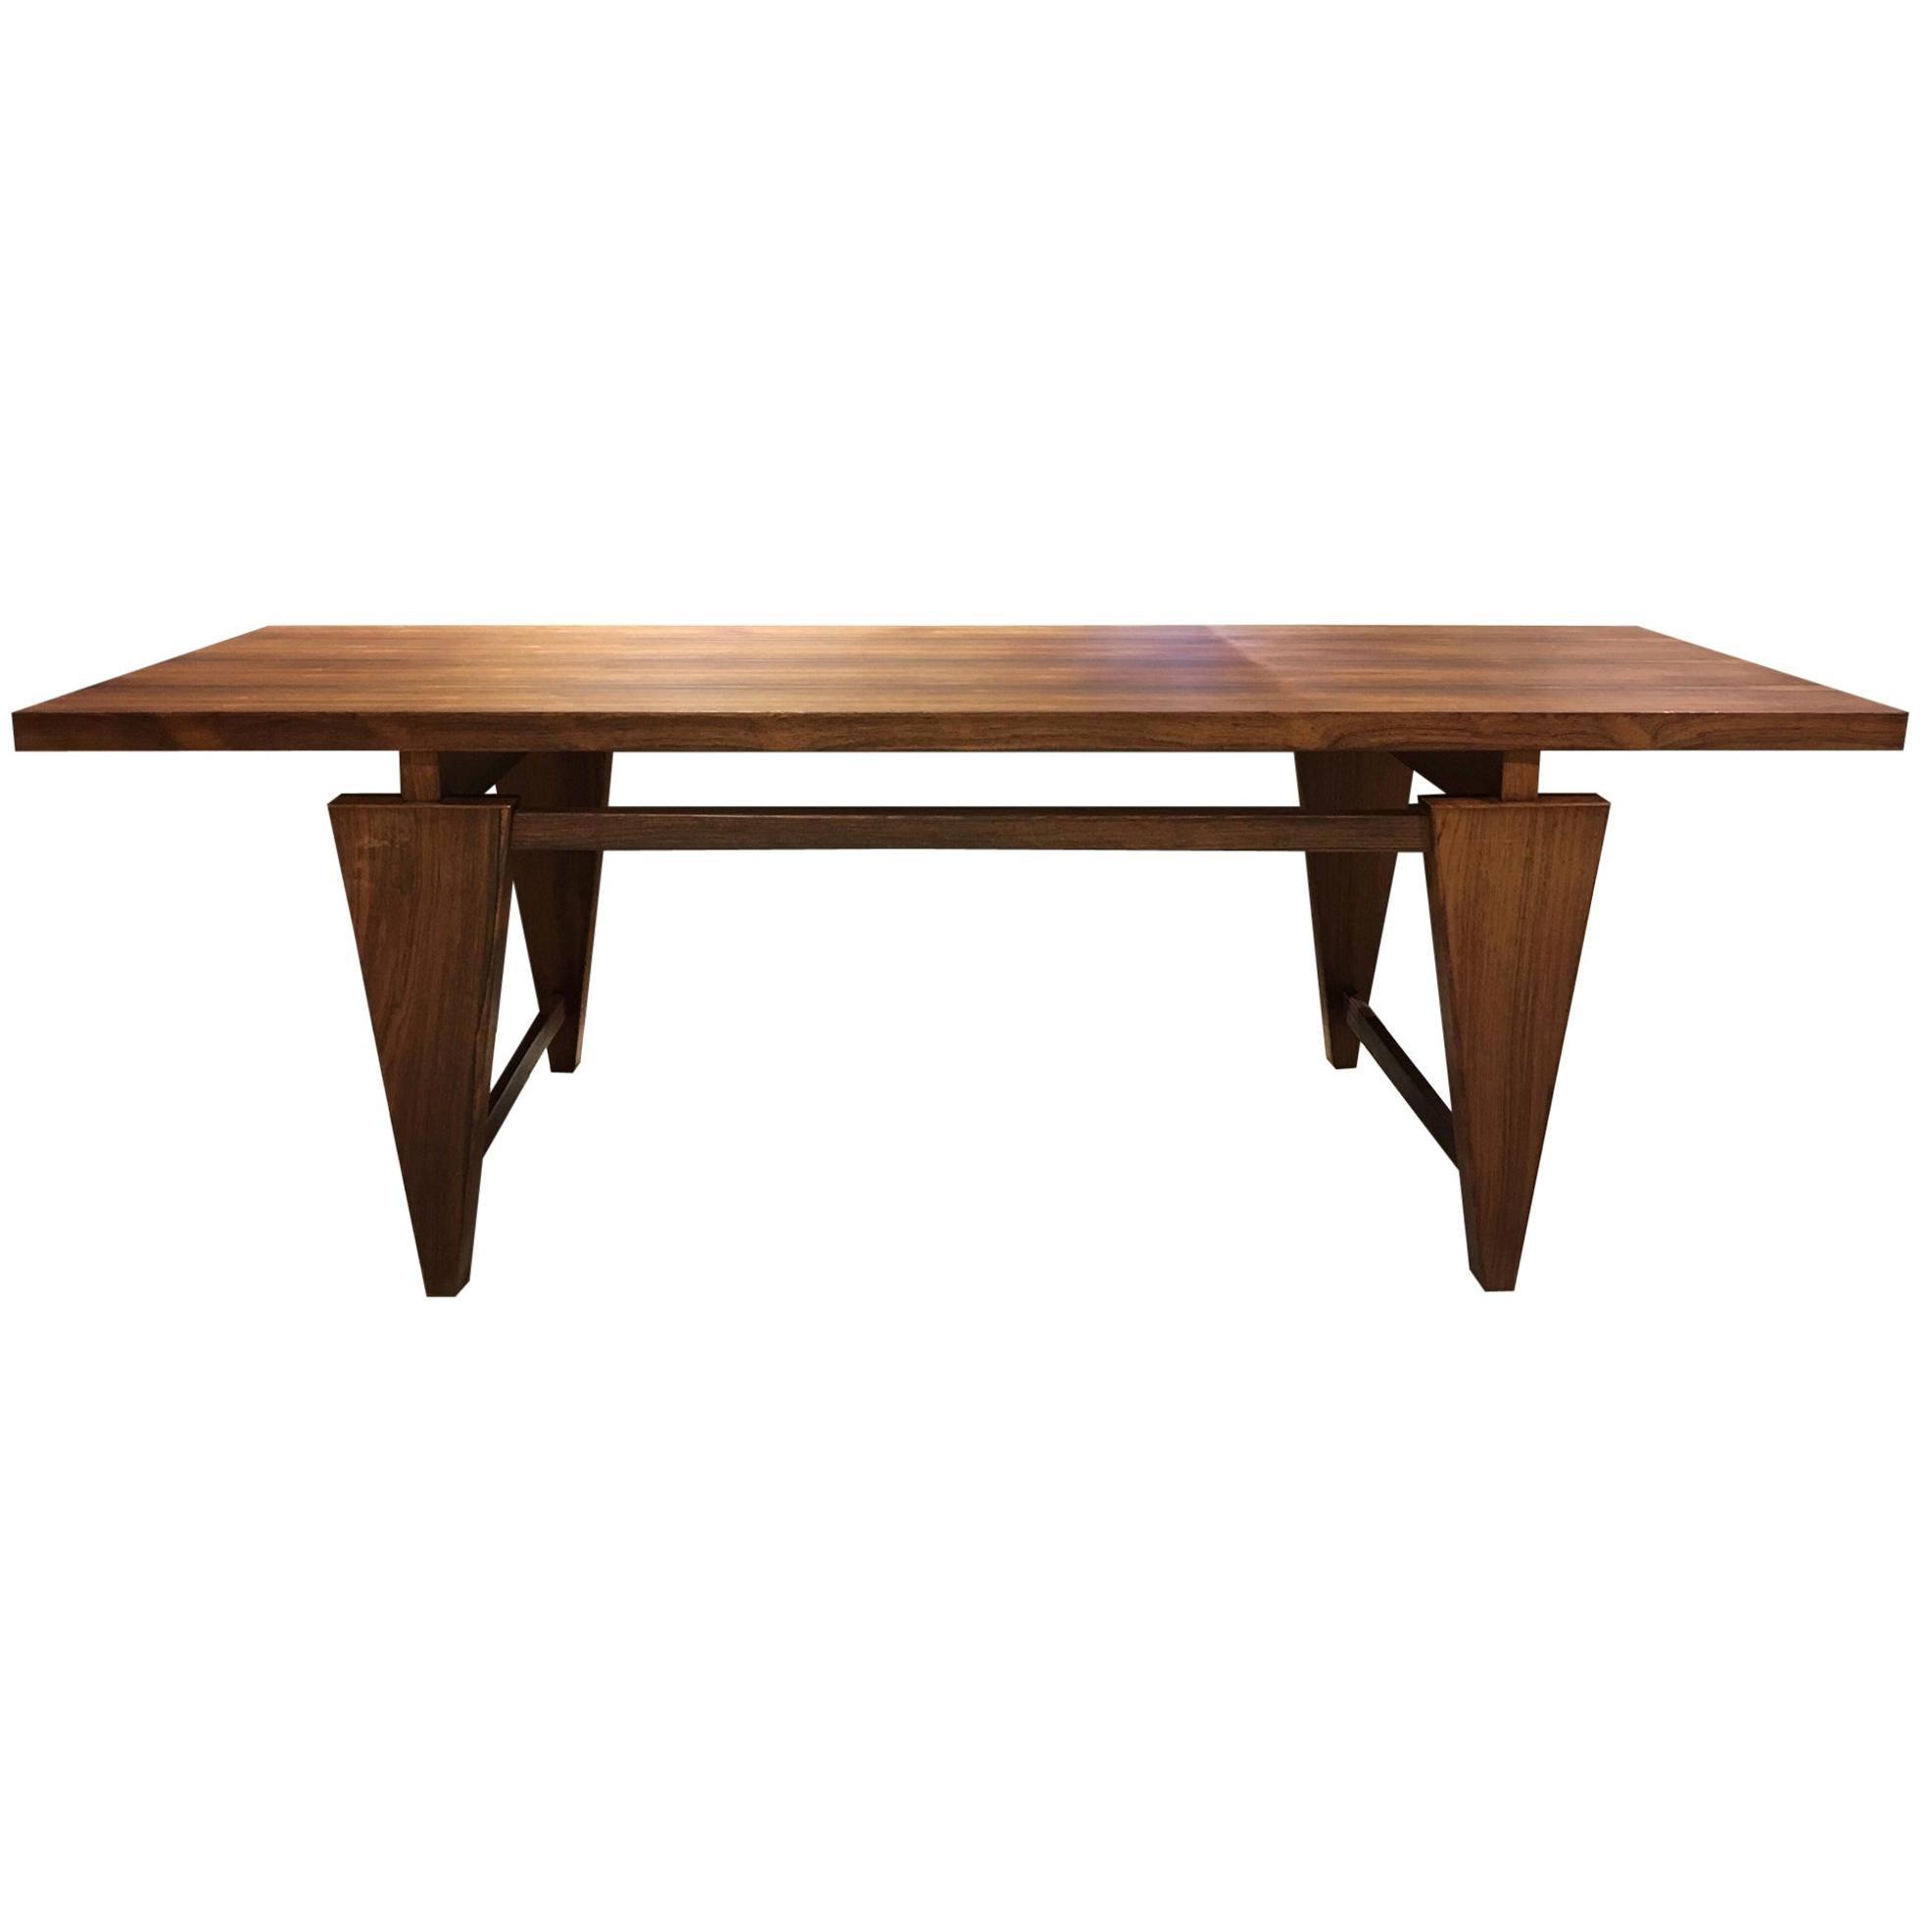 Illum Wikkelso Coffee Table, Model ML115